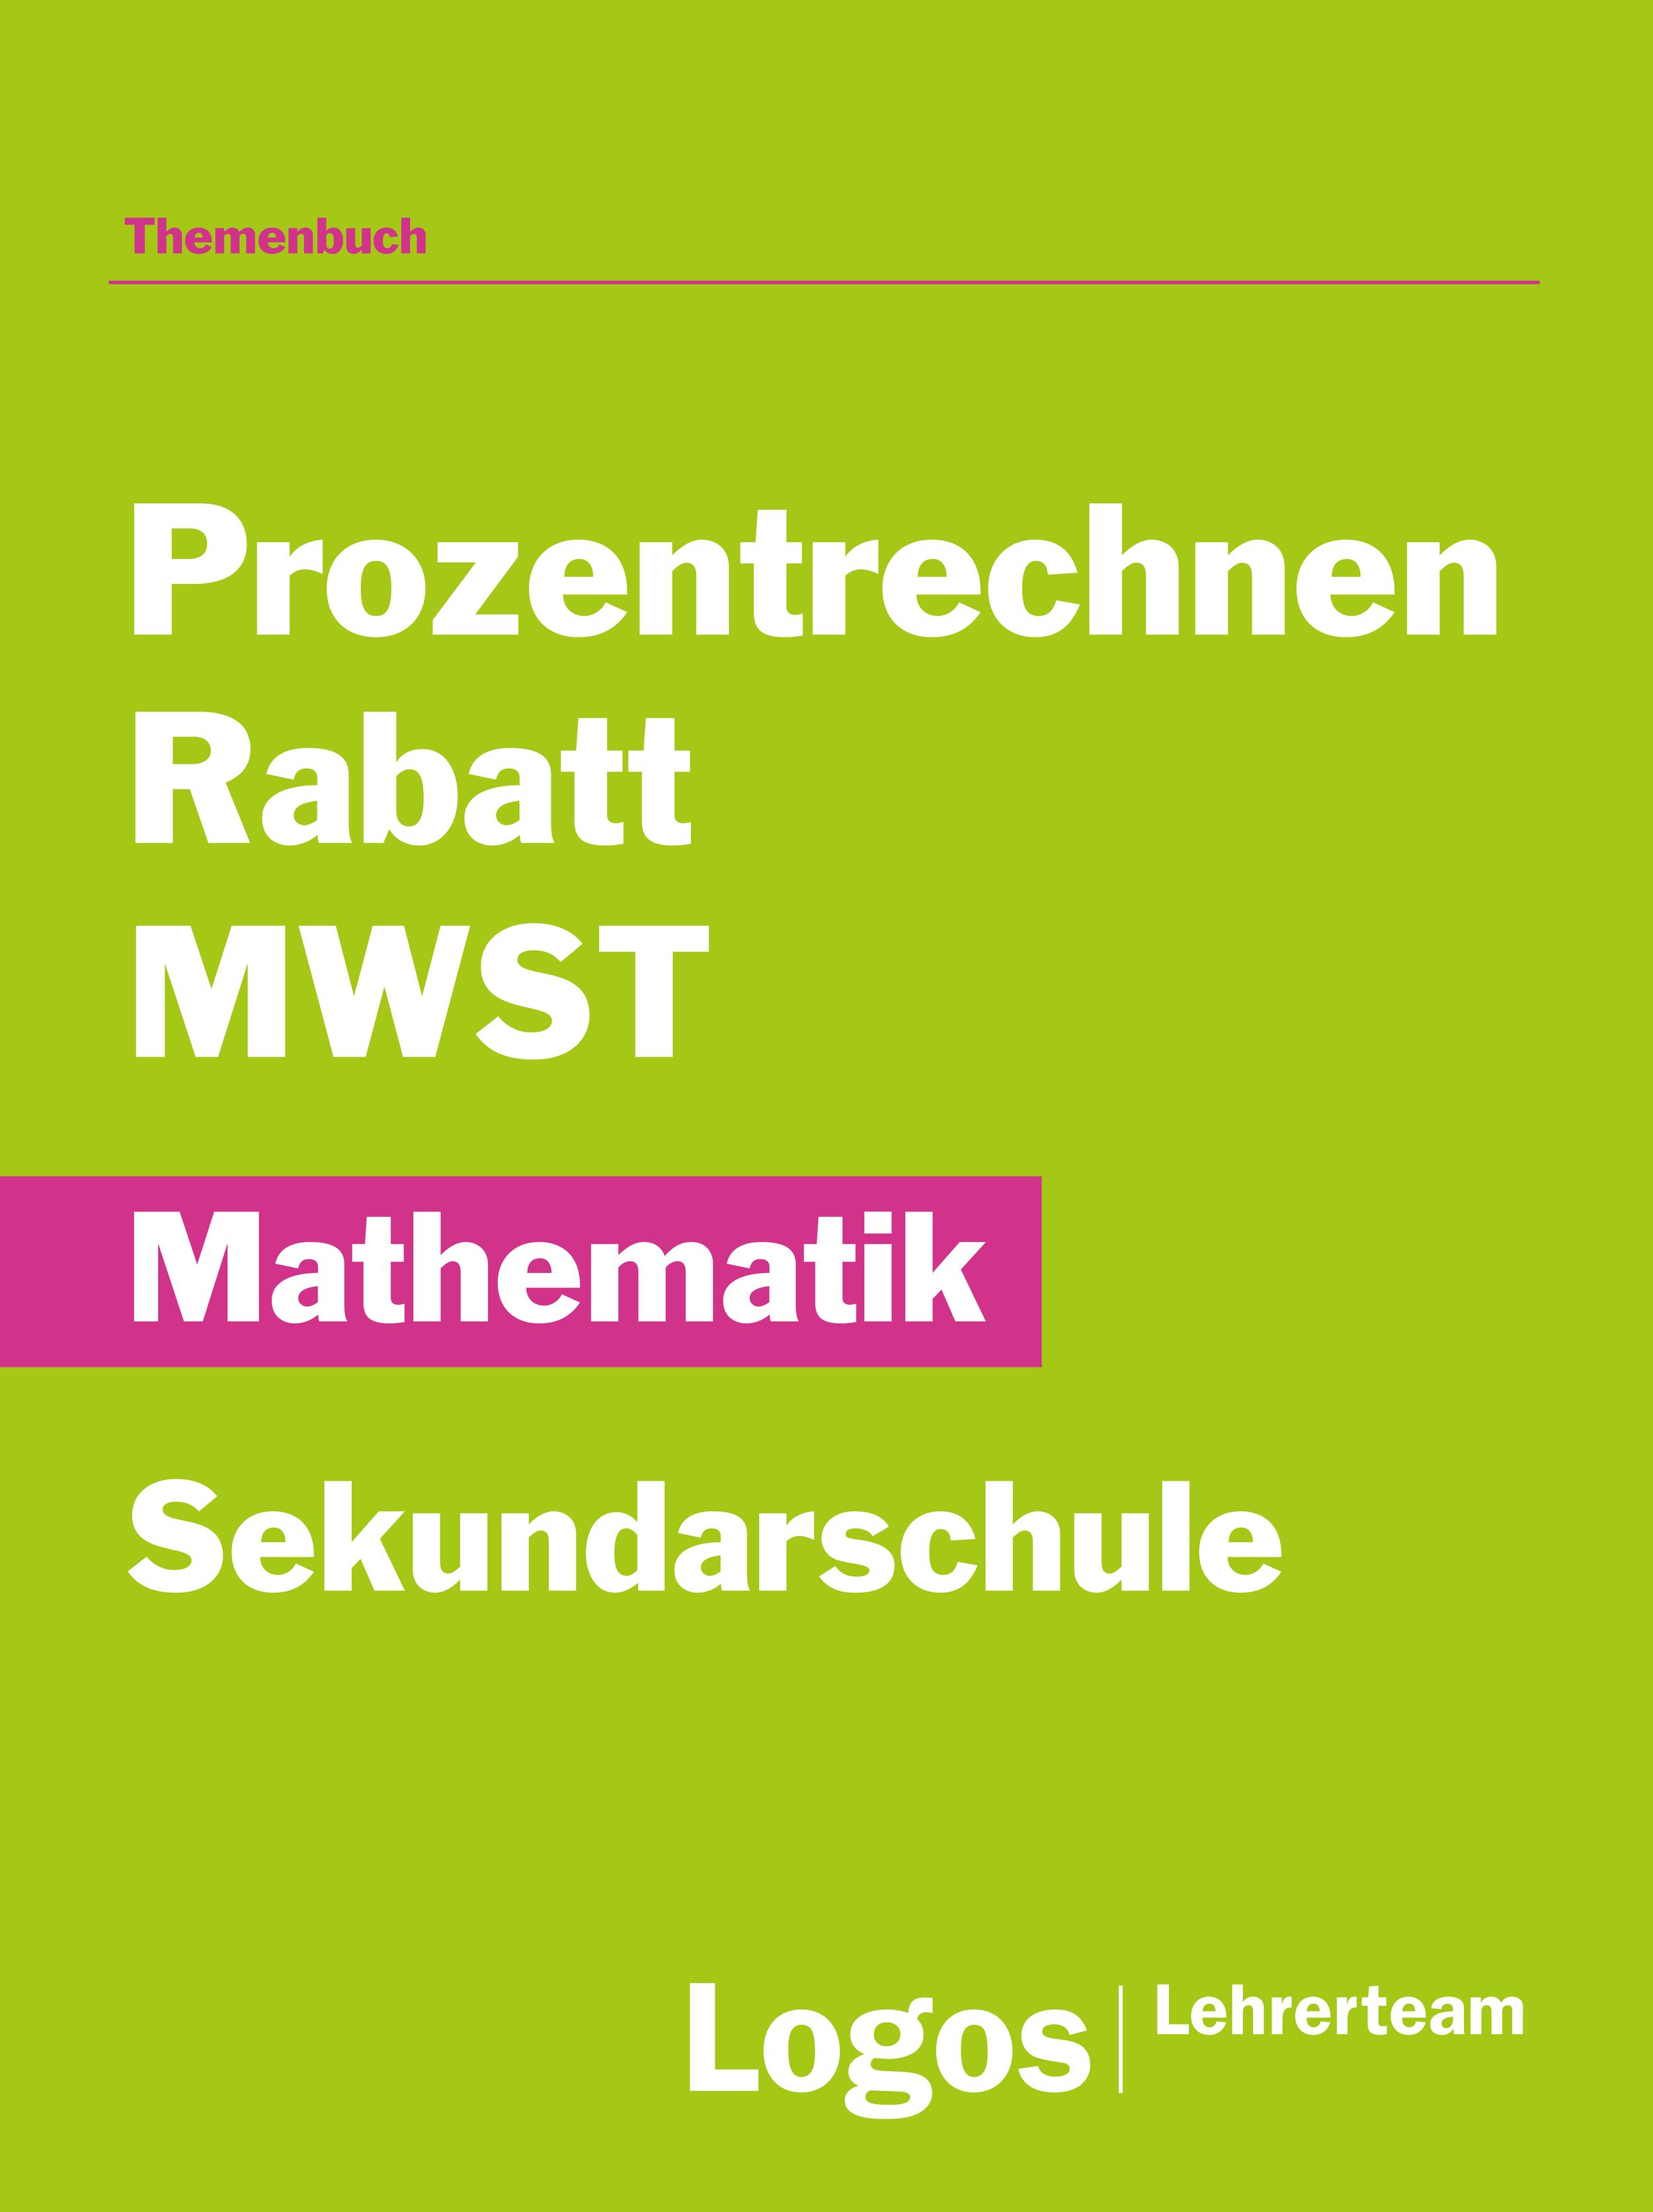 sekundar mathematik prozent rabatt mwst logos lehrerteam. Black Bedroom Furniture Sets. Home Design Ideas